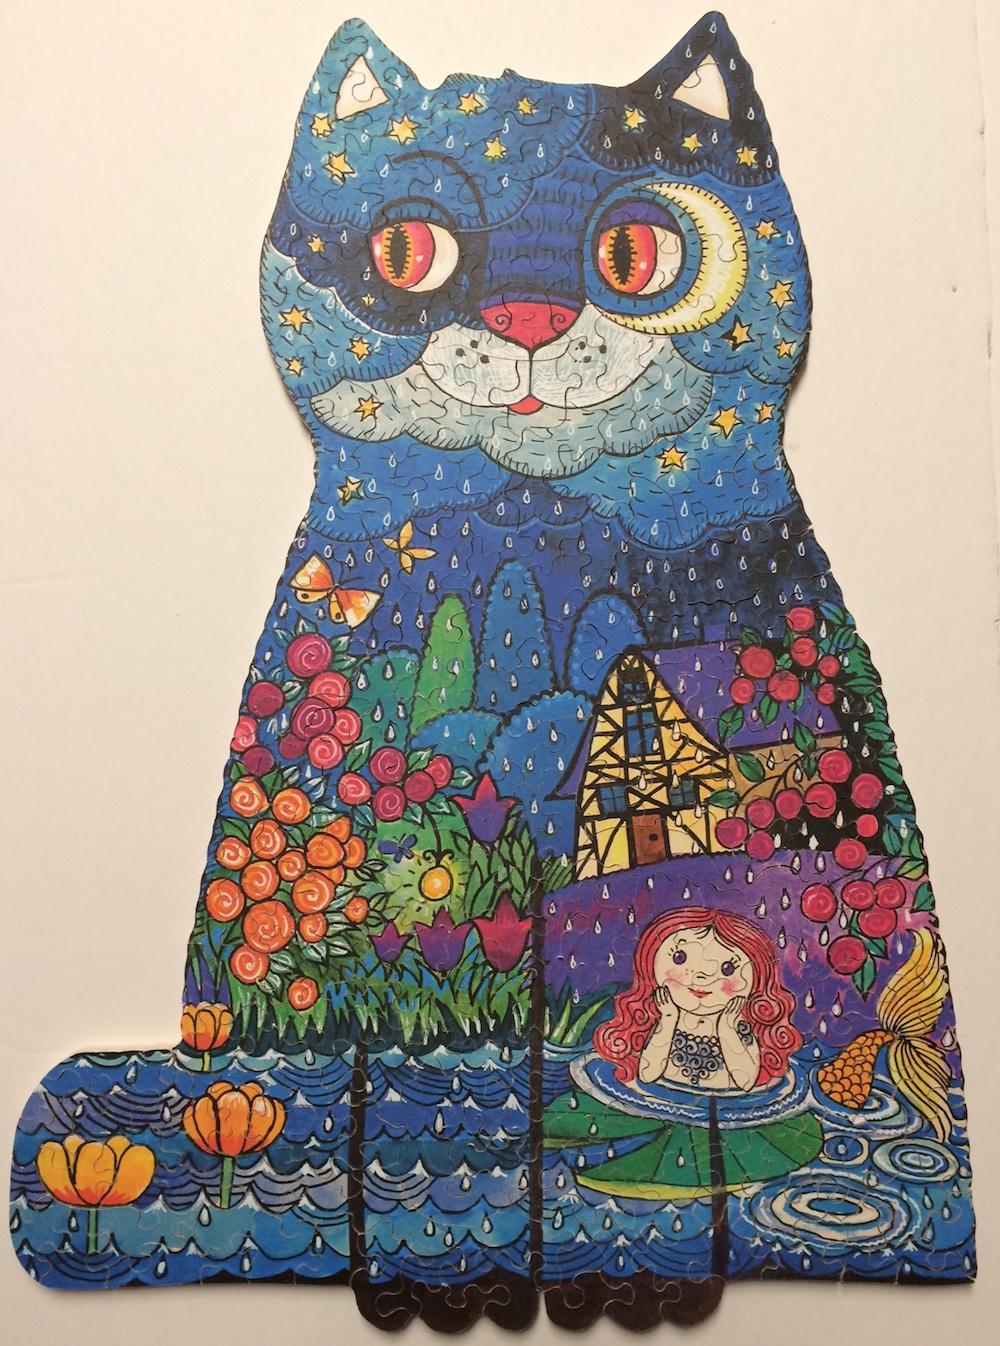 "Brand: Platinum Puzzles Title: Night Cat By: Diane (Dee) Rogers Artist: Oxana Zaika Size: 10.5"" x 14.5"""